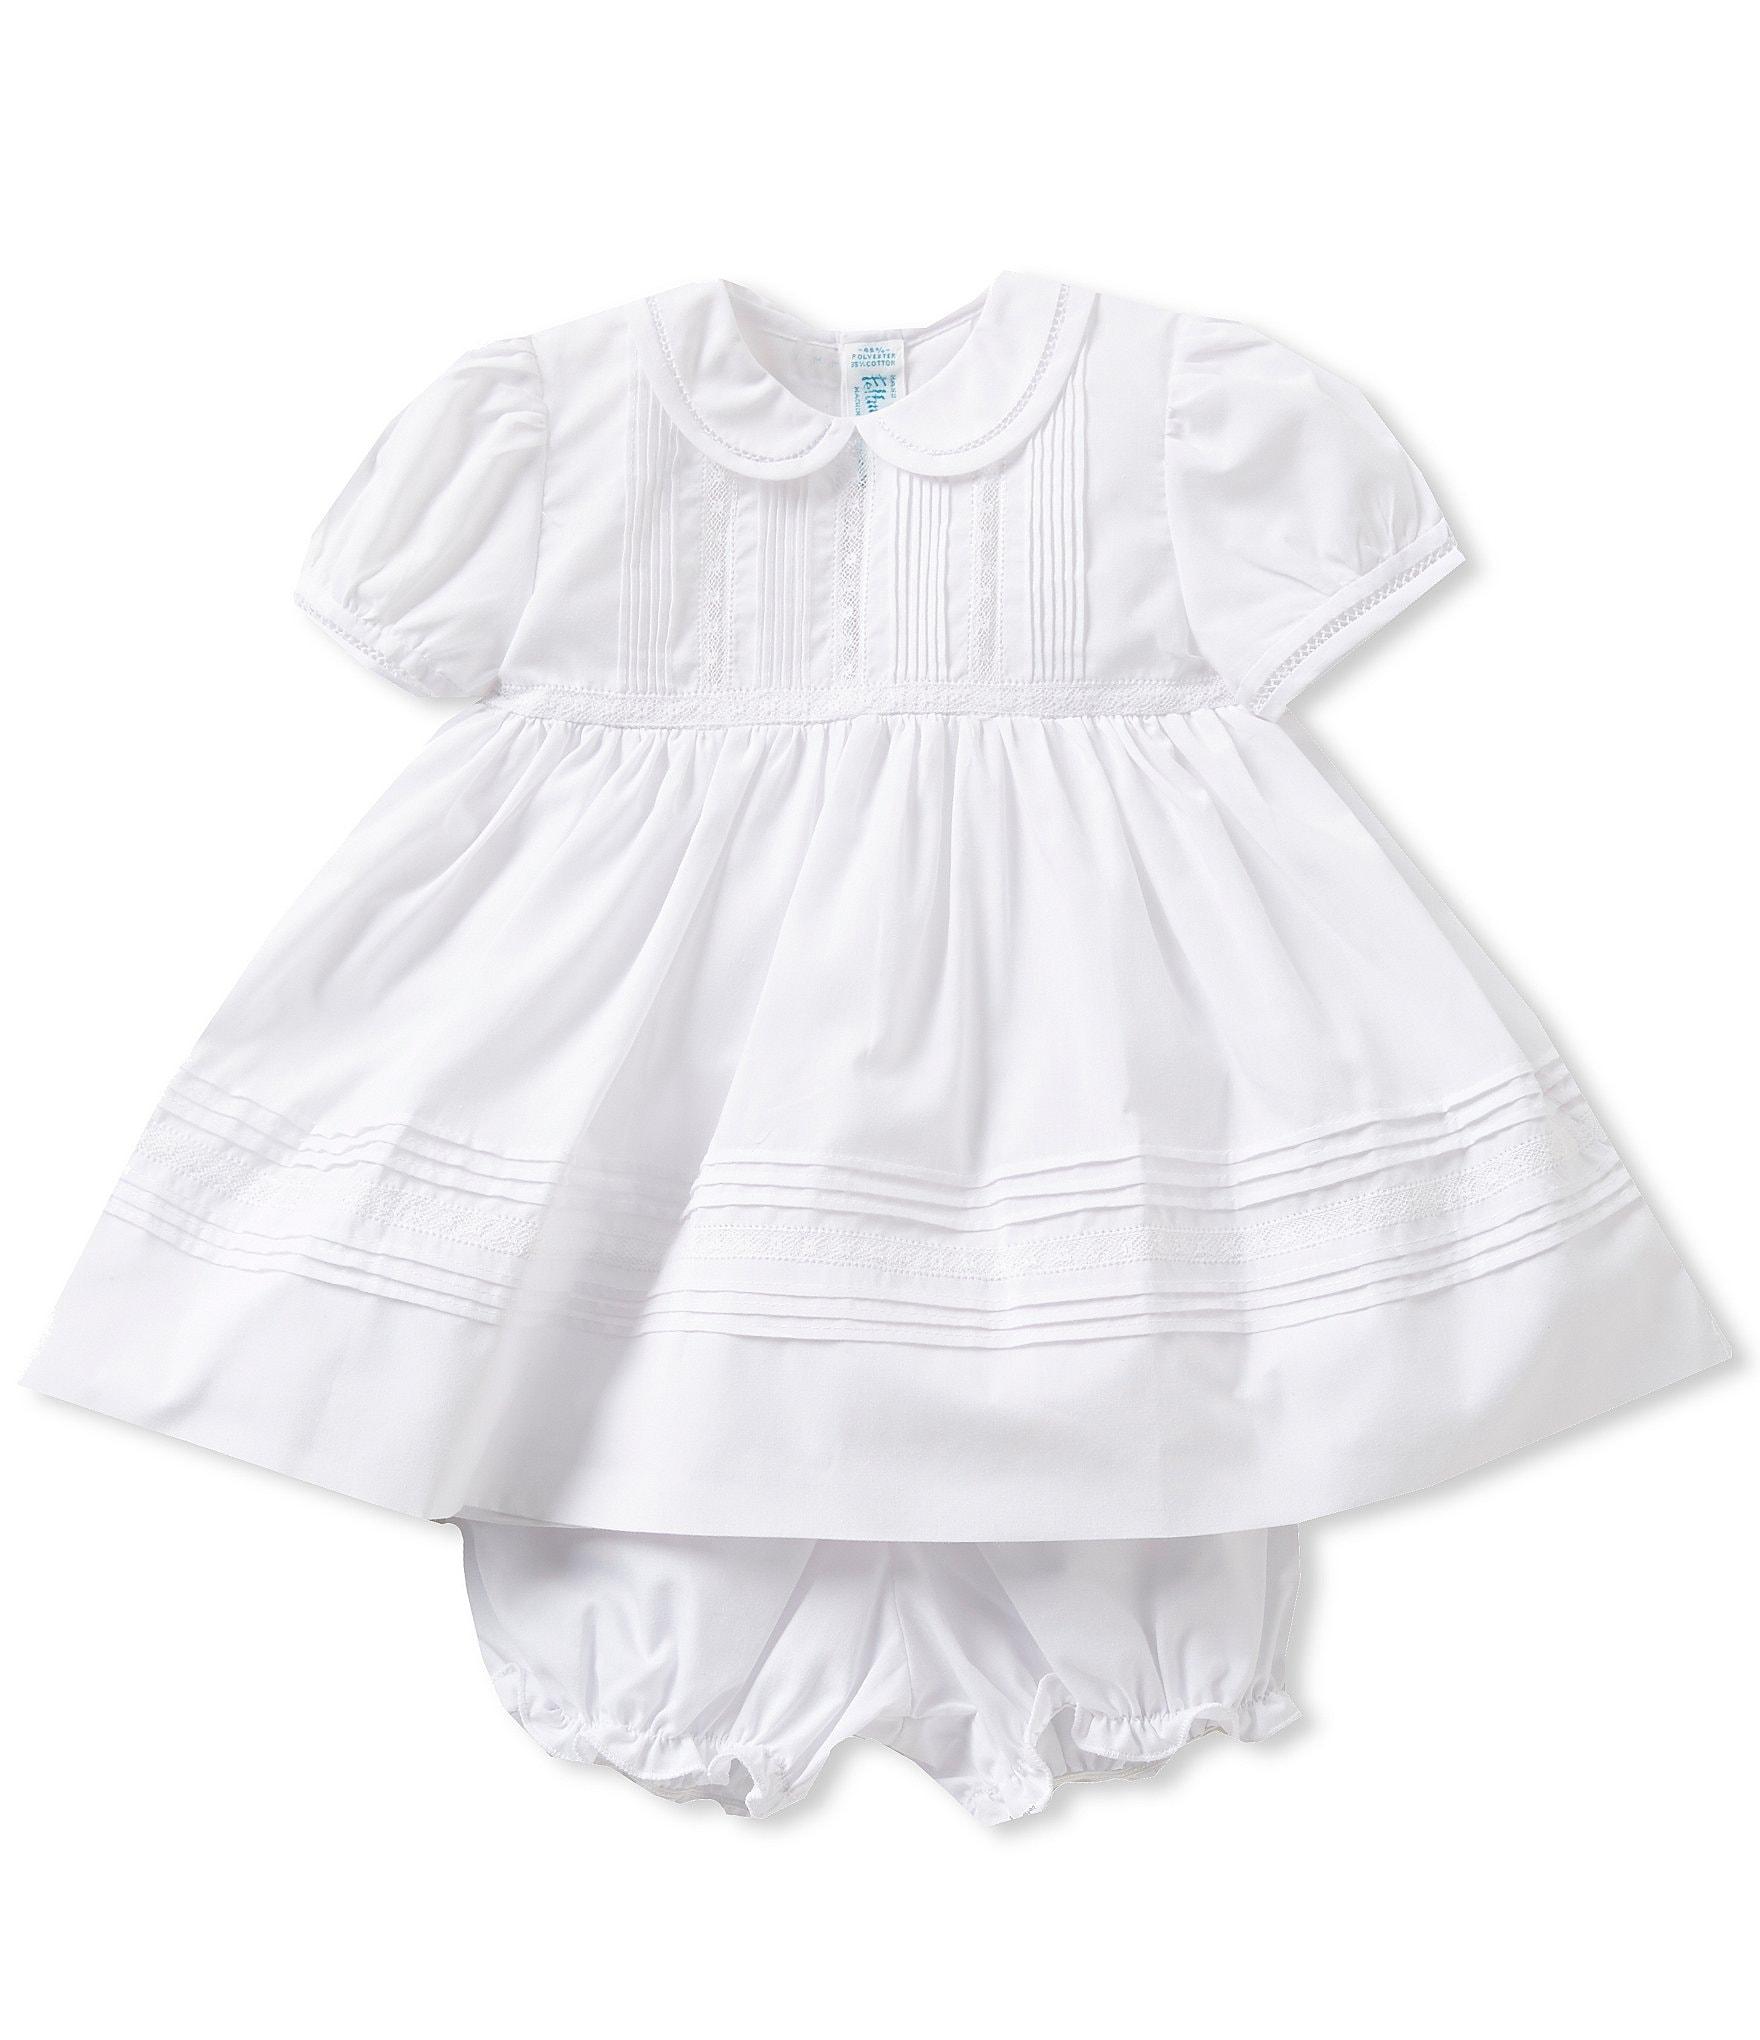 4b362c052552 Feltman Brothers Baby Girl Dresses | Dillard's